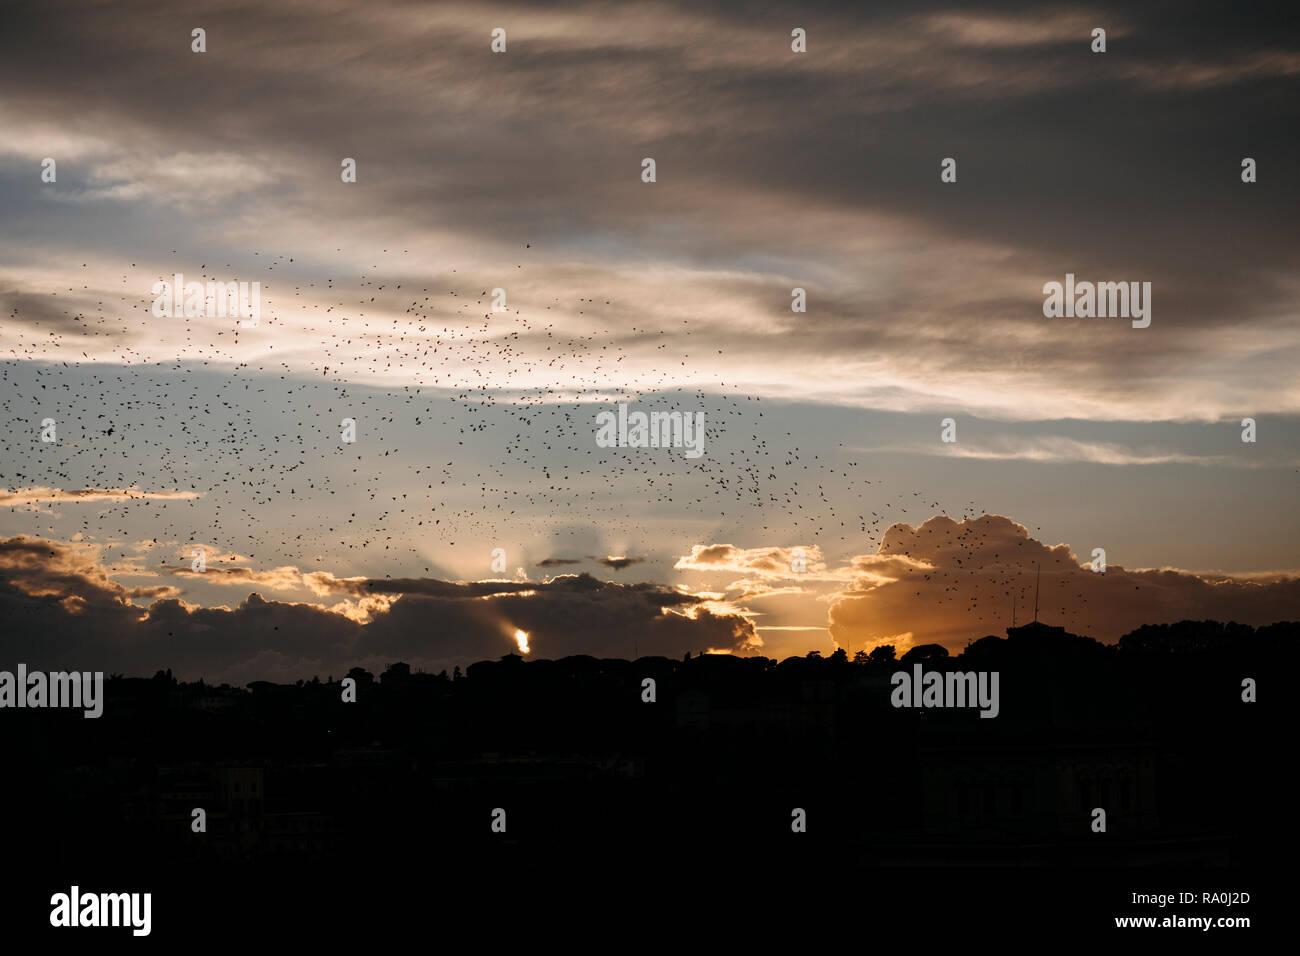 flocks of birds - Stock Image